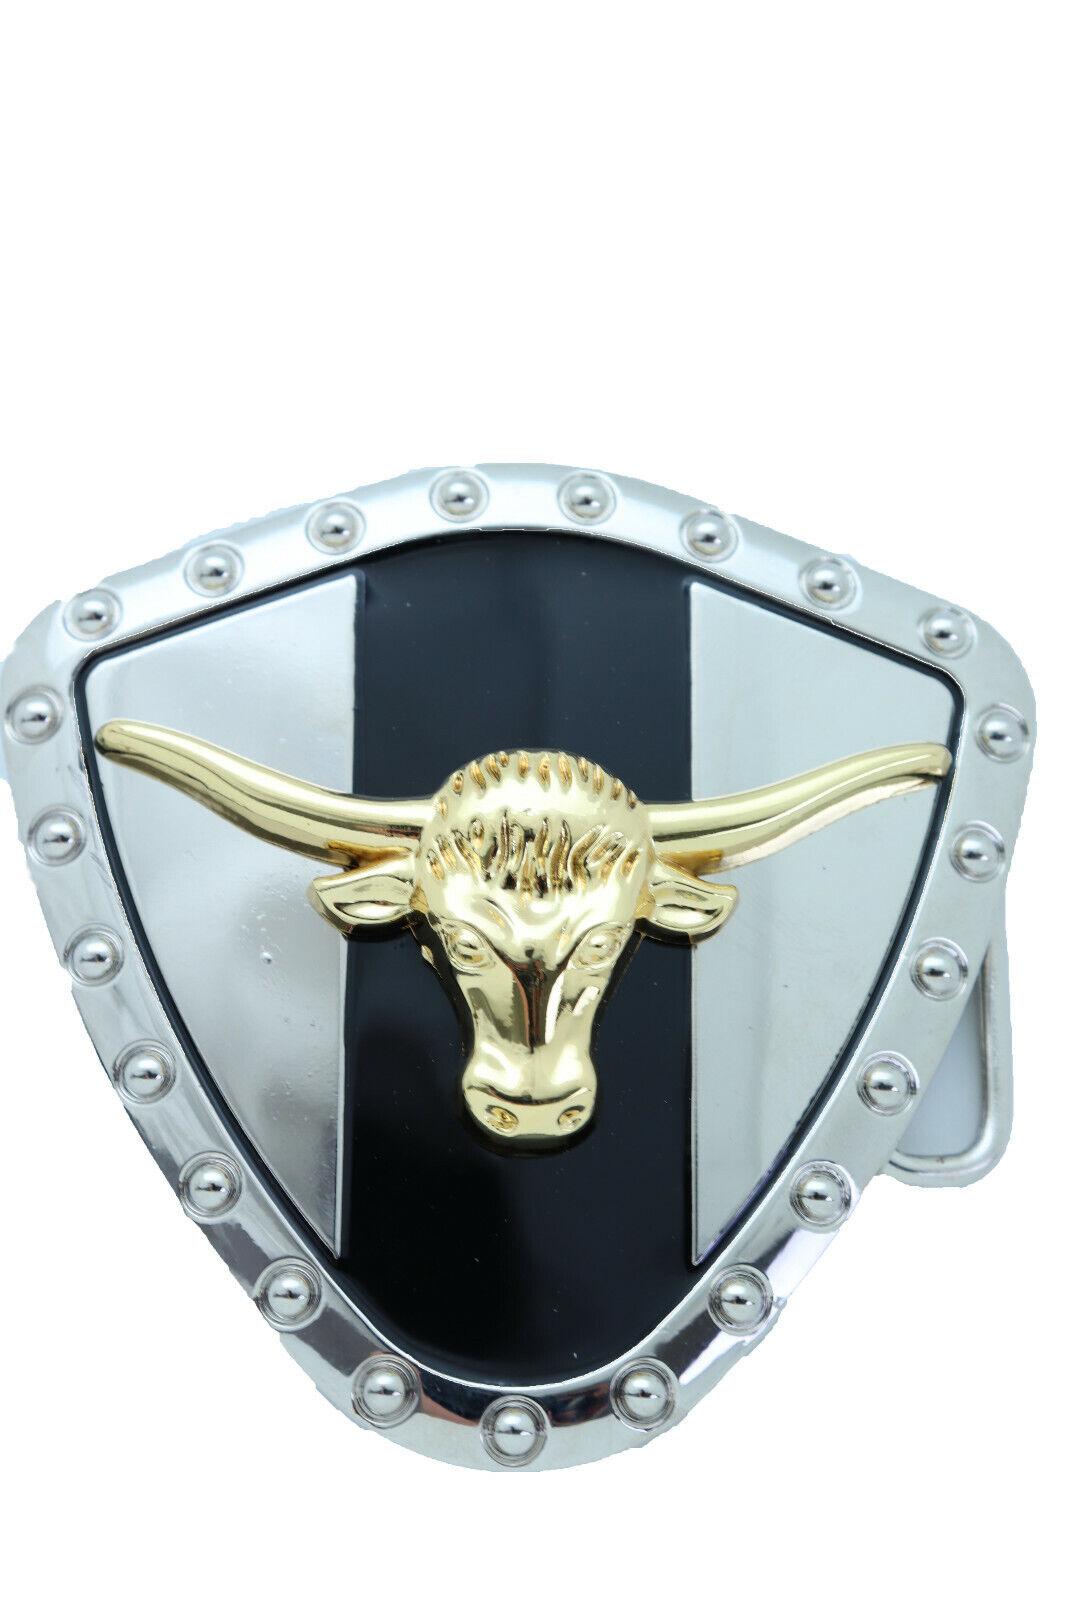 Herren Damen Silber Metal Modische Western Schnalle Texas Lone Hupe Kuh Bulle